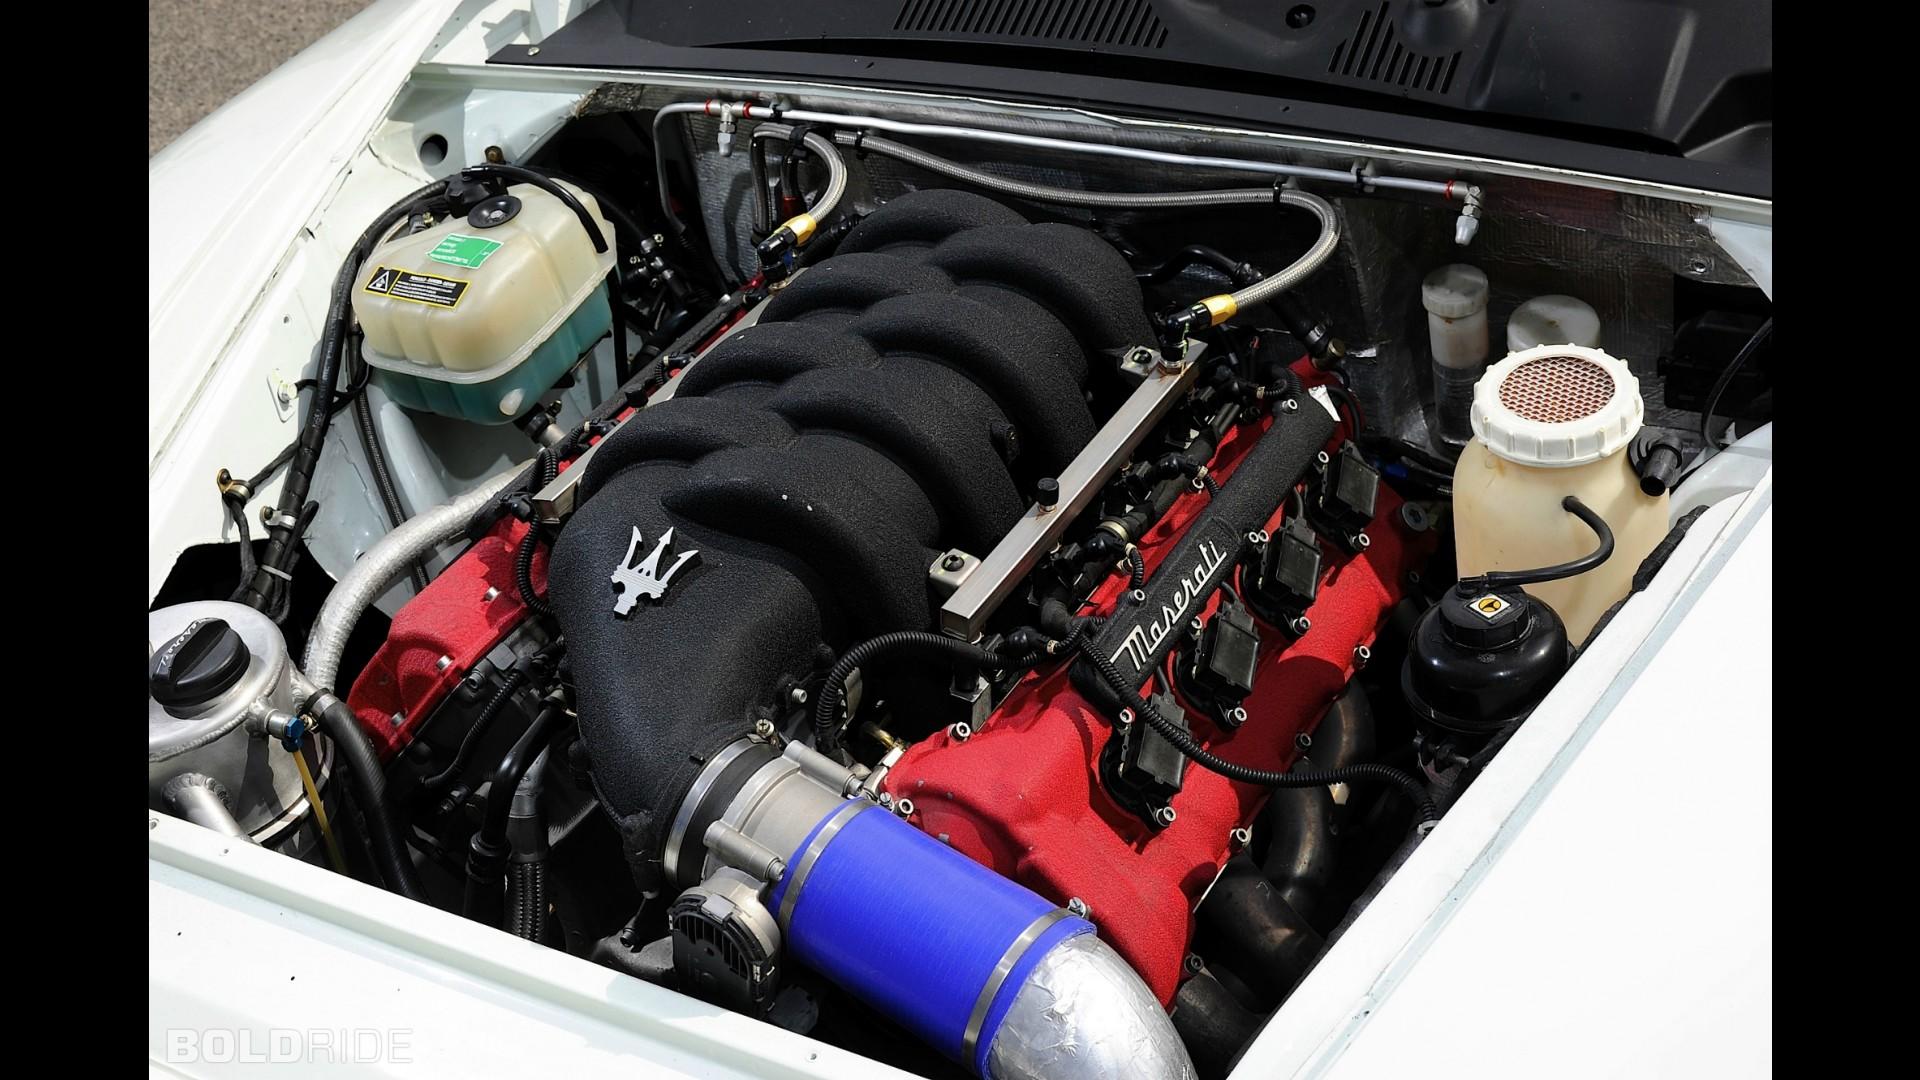 https://icdn-0.motor1.com/images/mgl/kzGzB/s1/maserati-trofeo-light.jpg